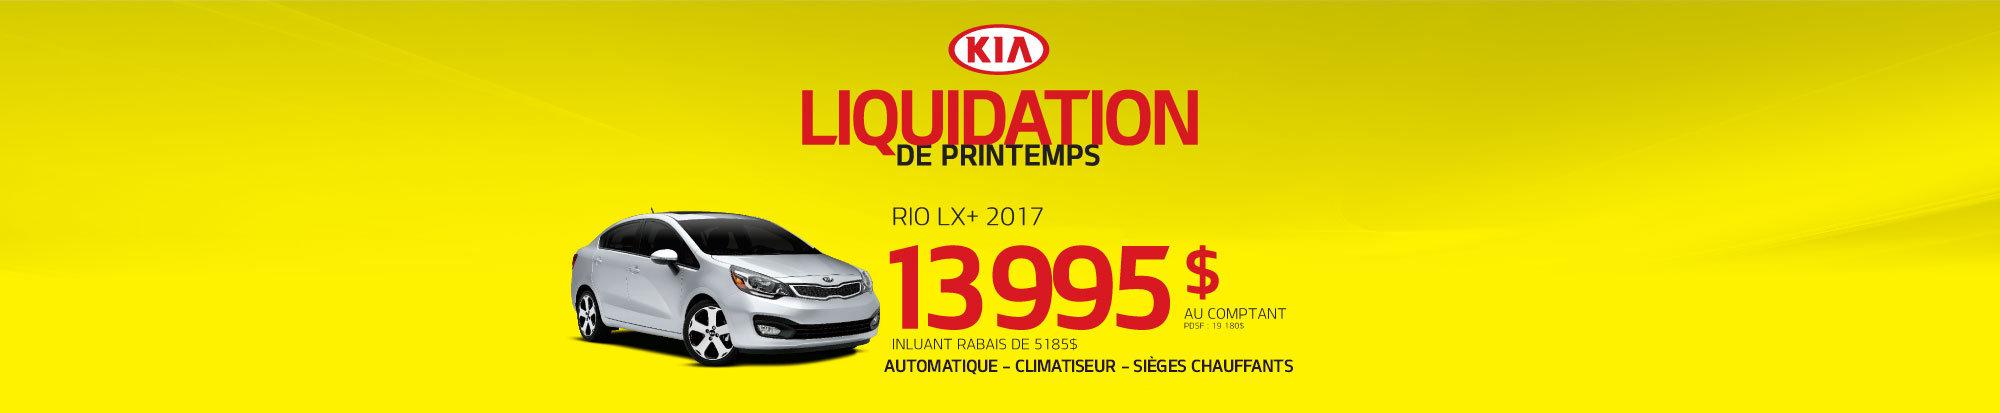 Liquidation de printemps - Rio LX+ - web